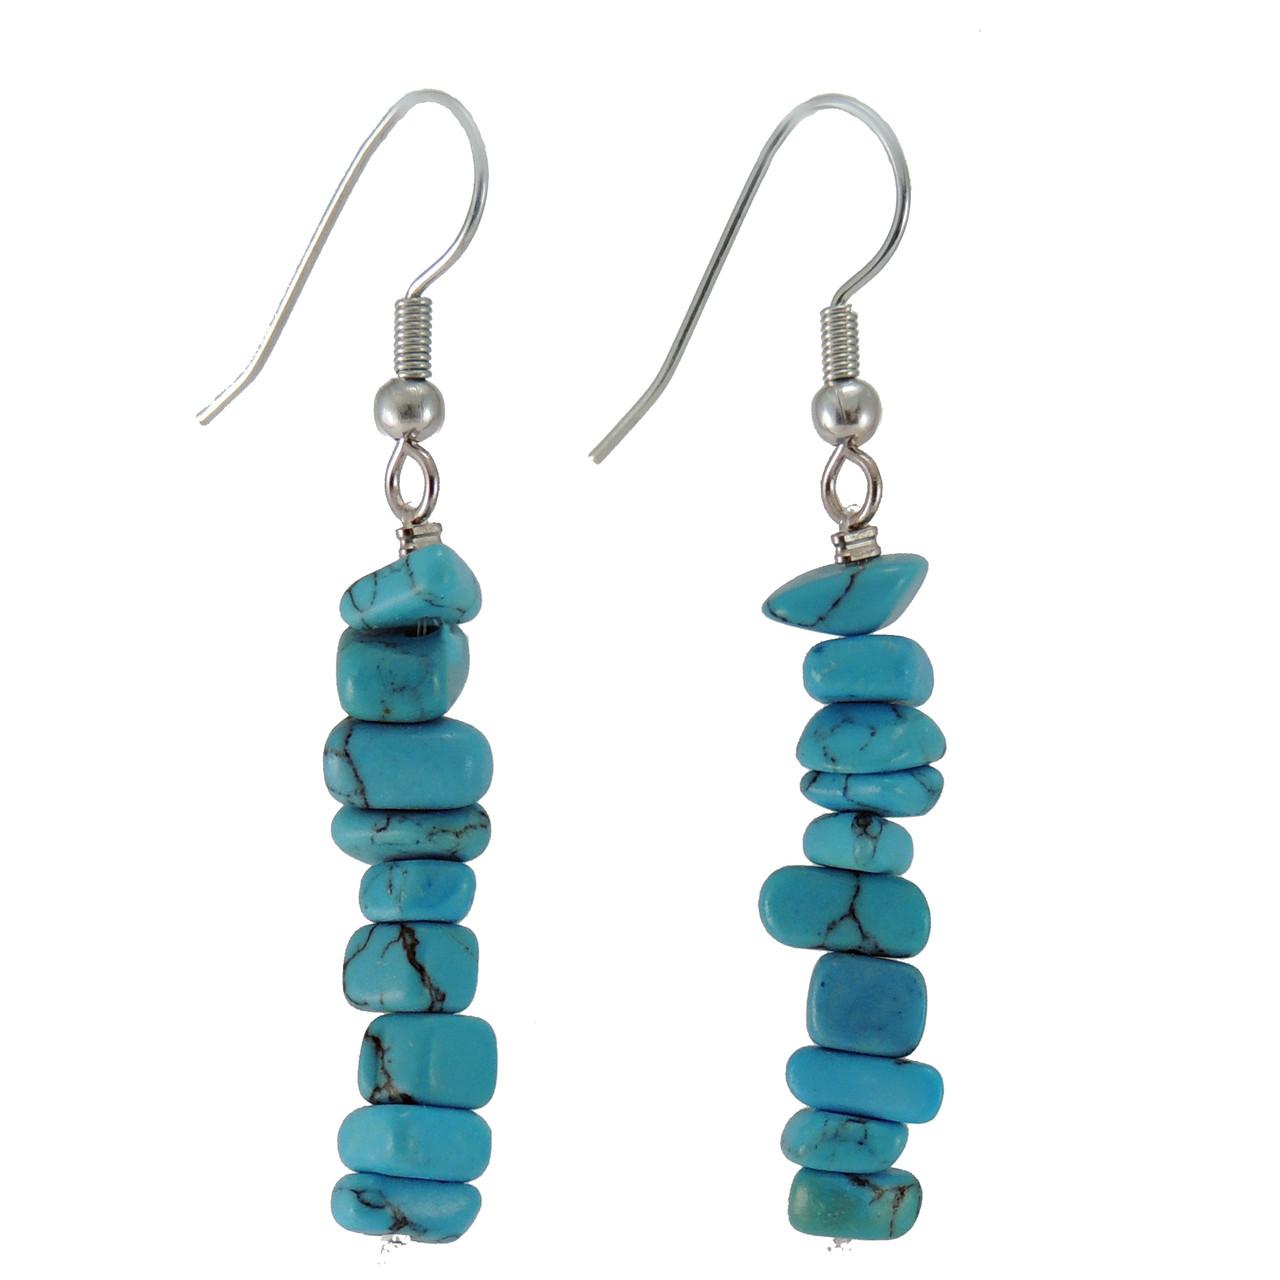 GETQ-KGEB3tq Turquoise Howlite Chip Earrings